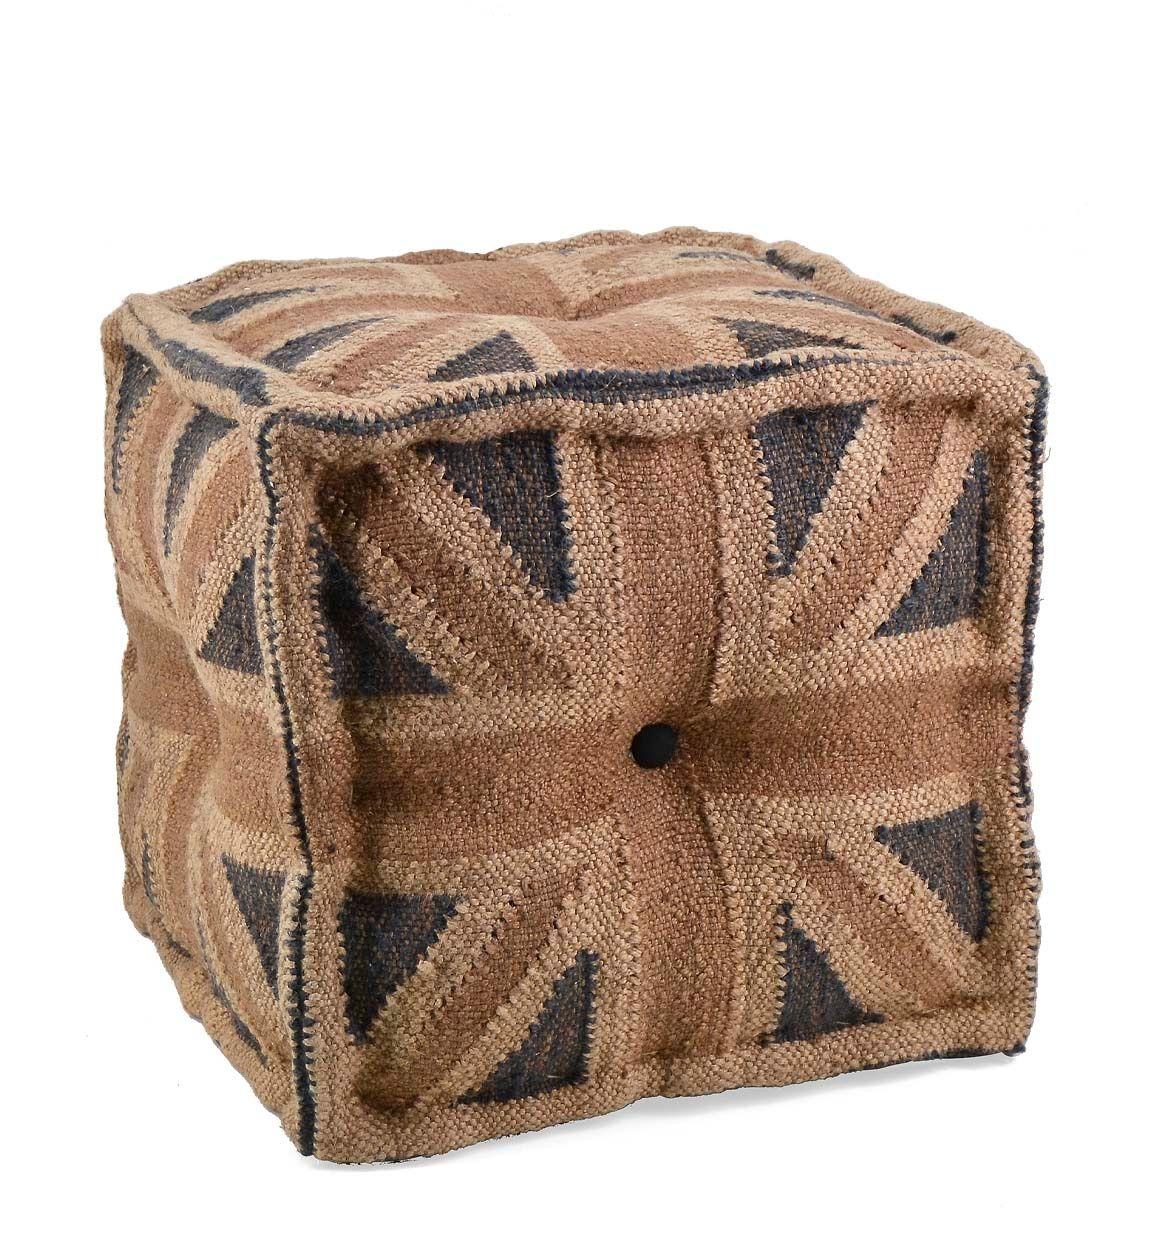 Taburet din lana si iuta England Multicolor, l40xA40xH40 cm imagine